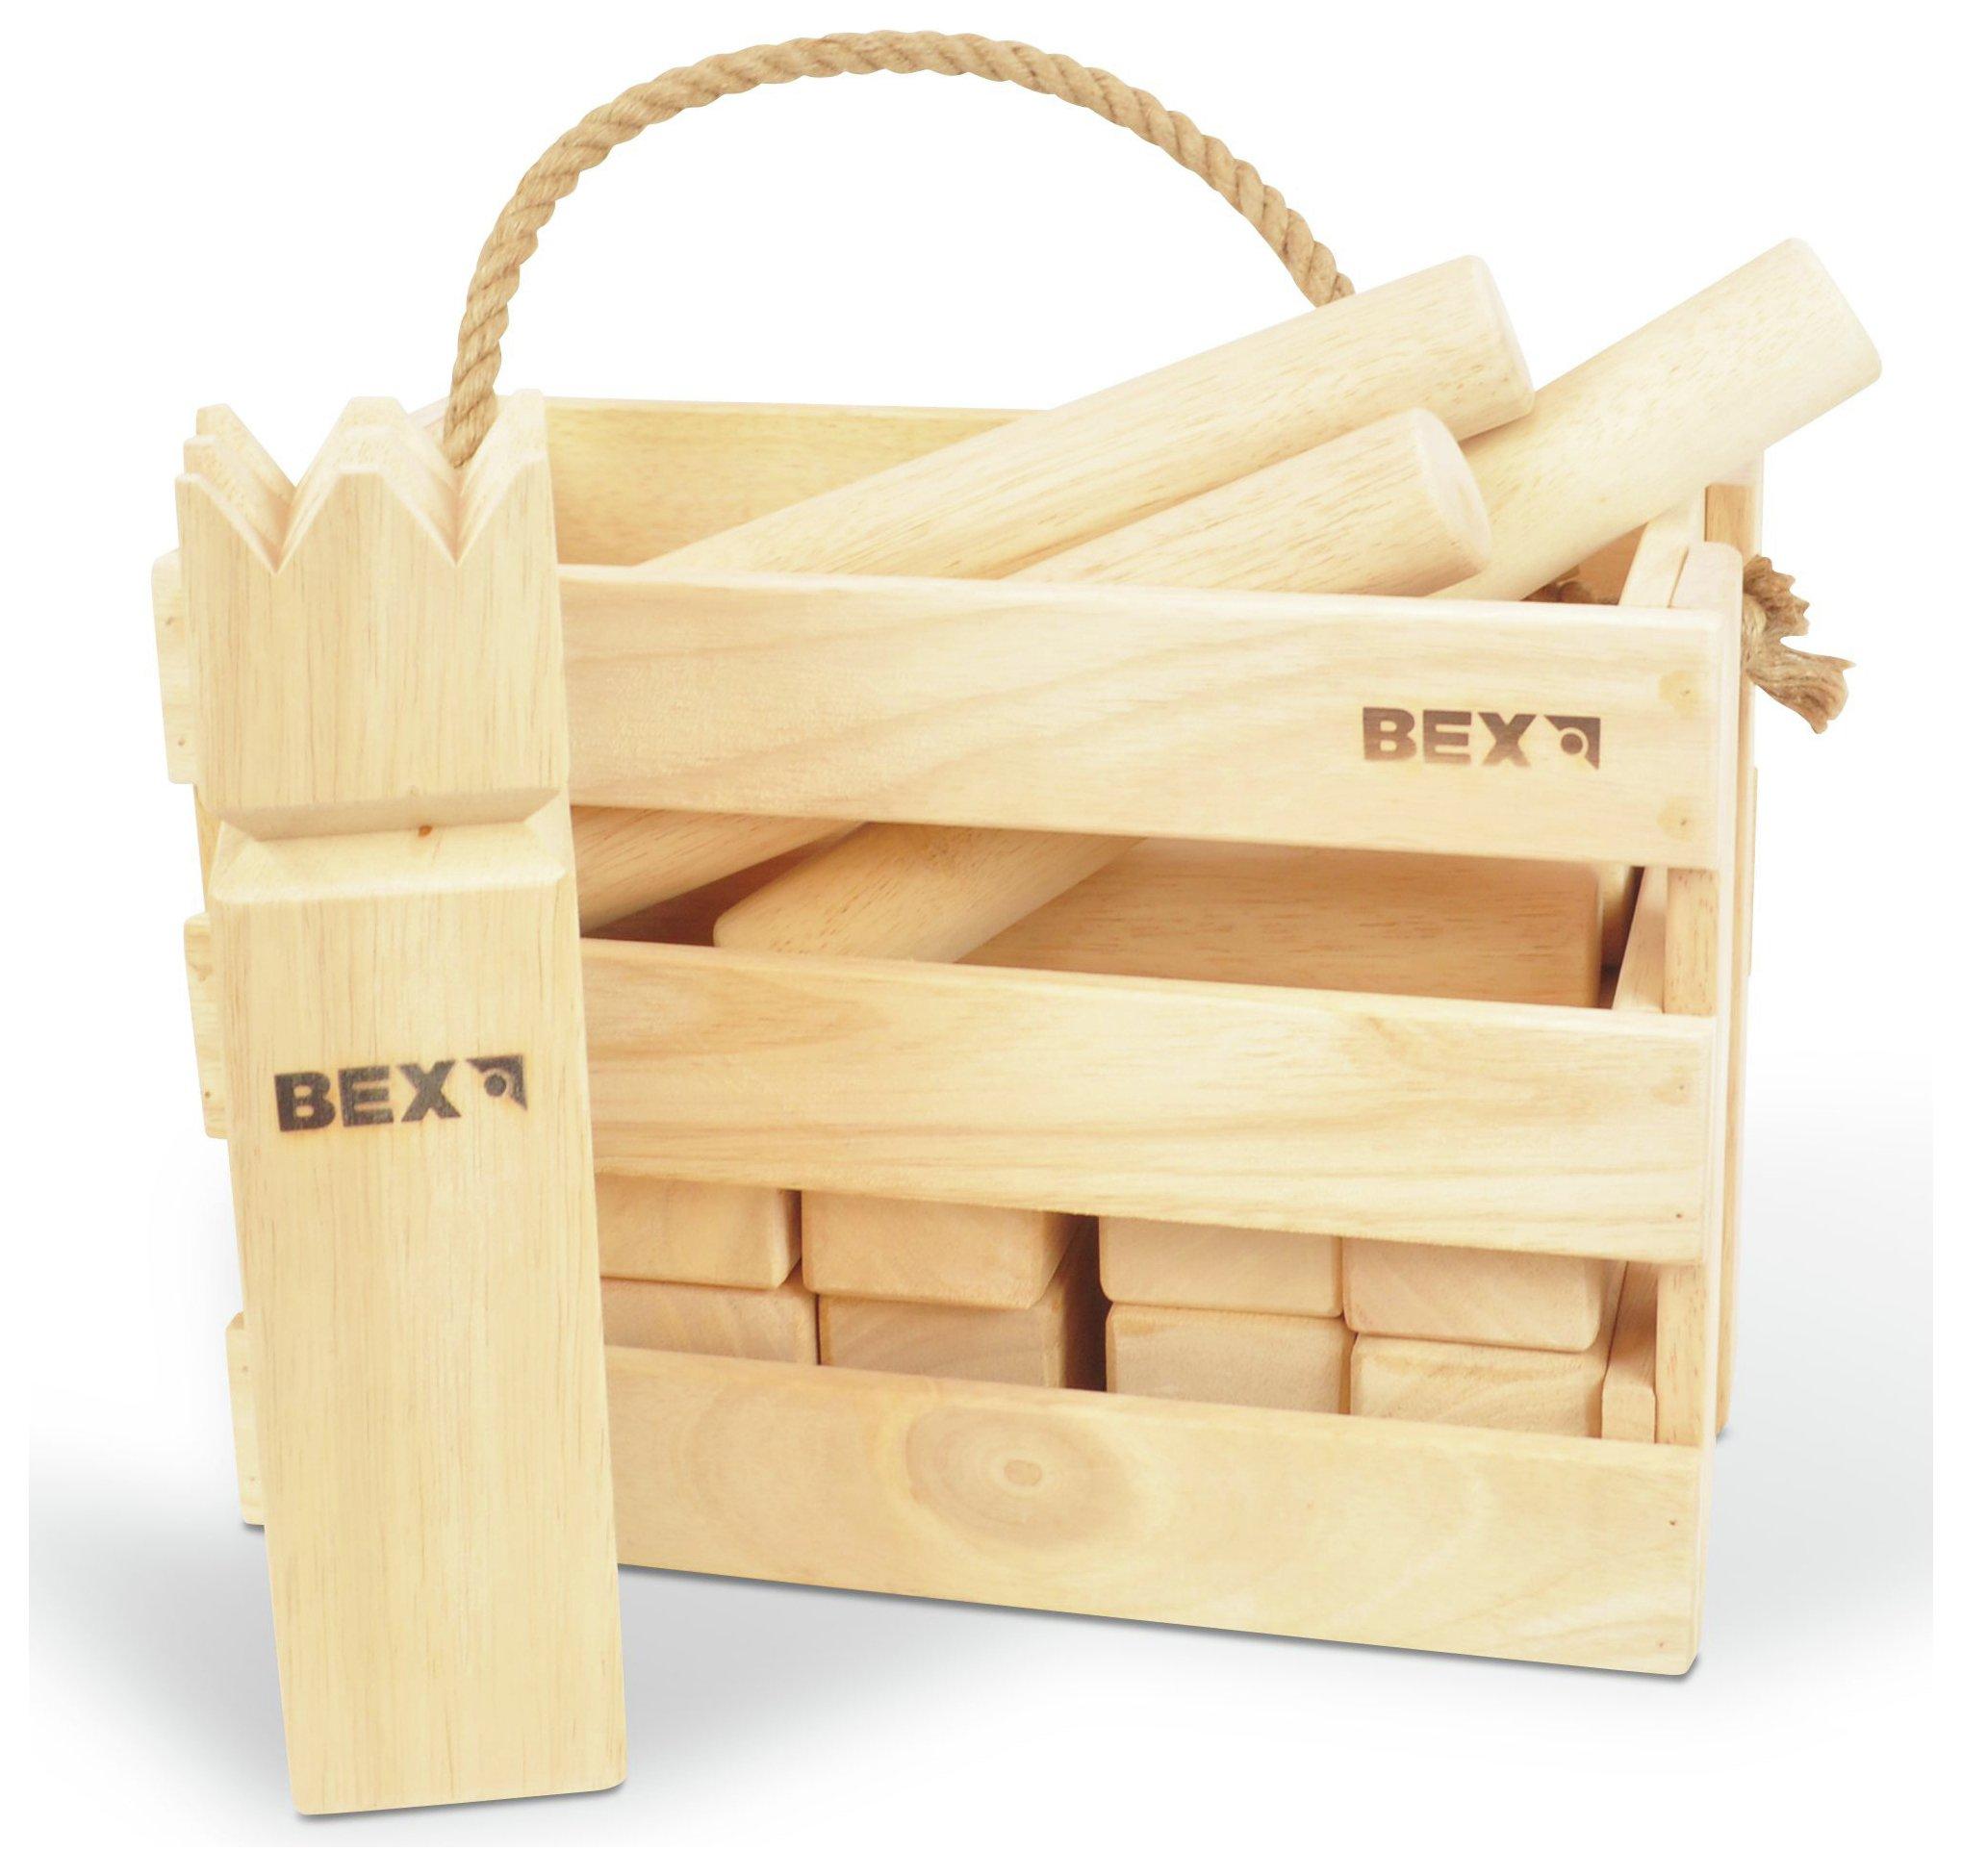 Image of Bex Original Kubb Game in Wooden Box.